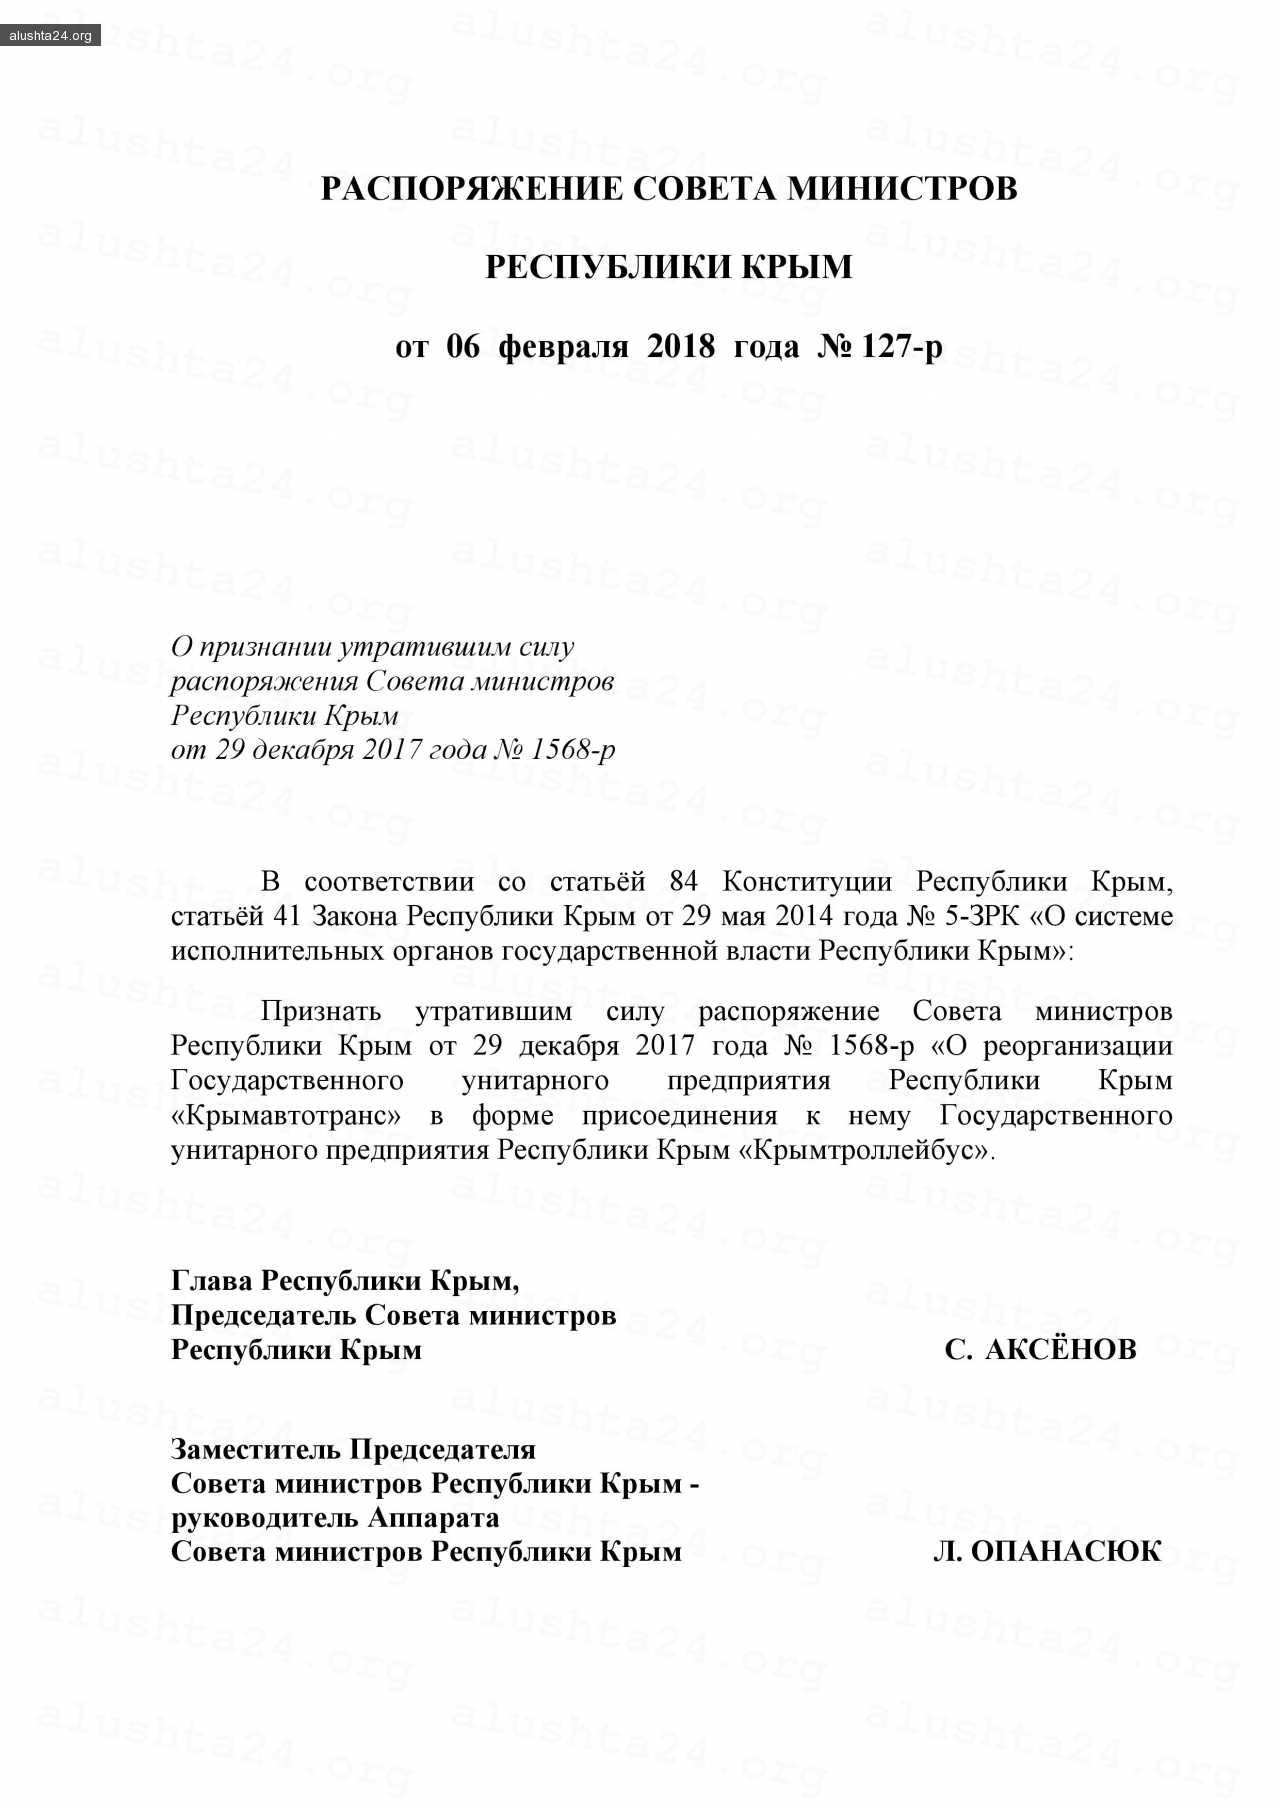 Все об Алуште: Аксенов пояснил отказ от реорганизации Крымтроллейбуса